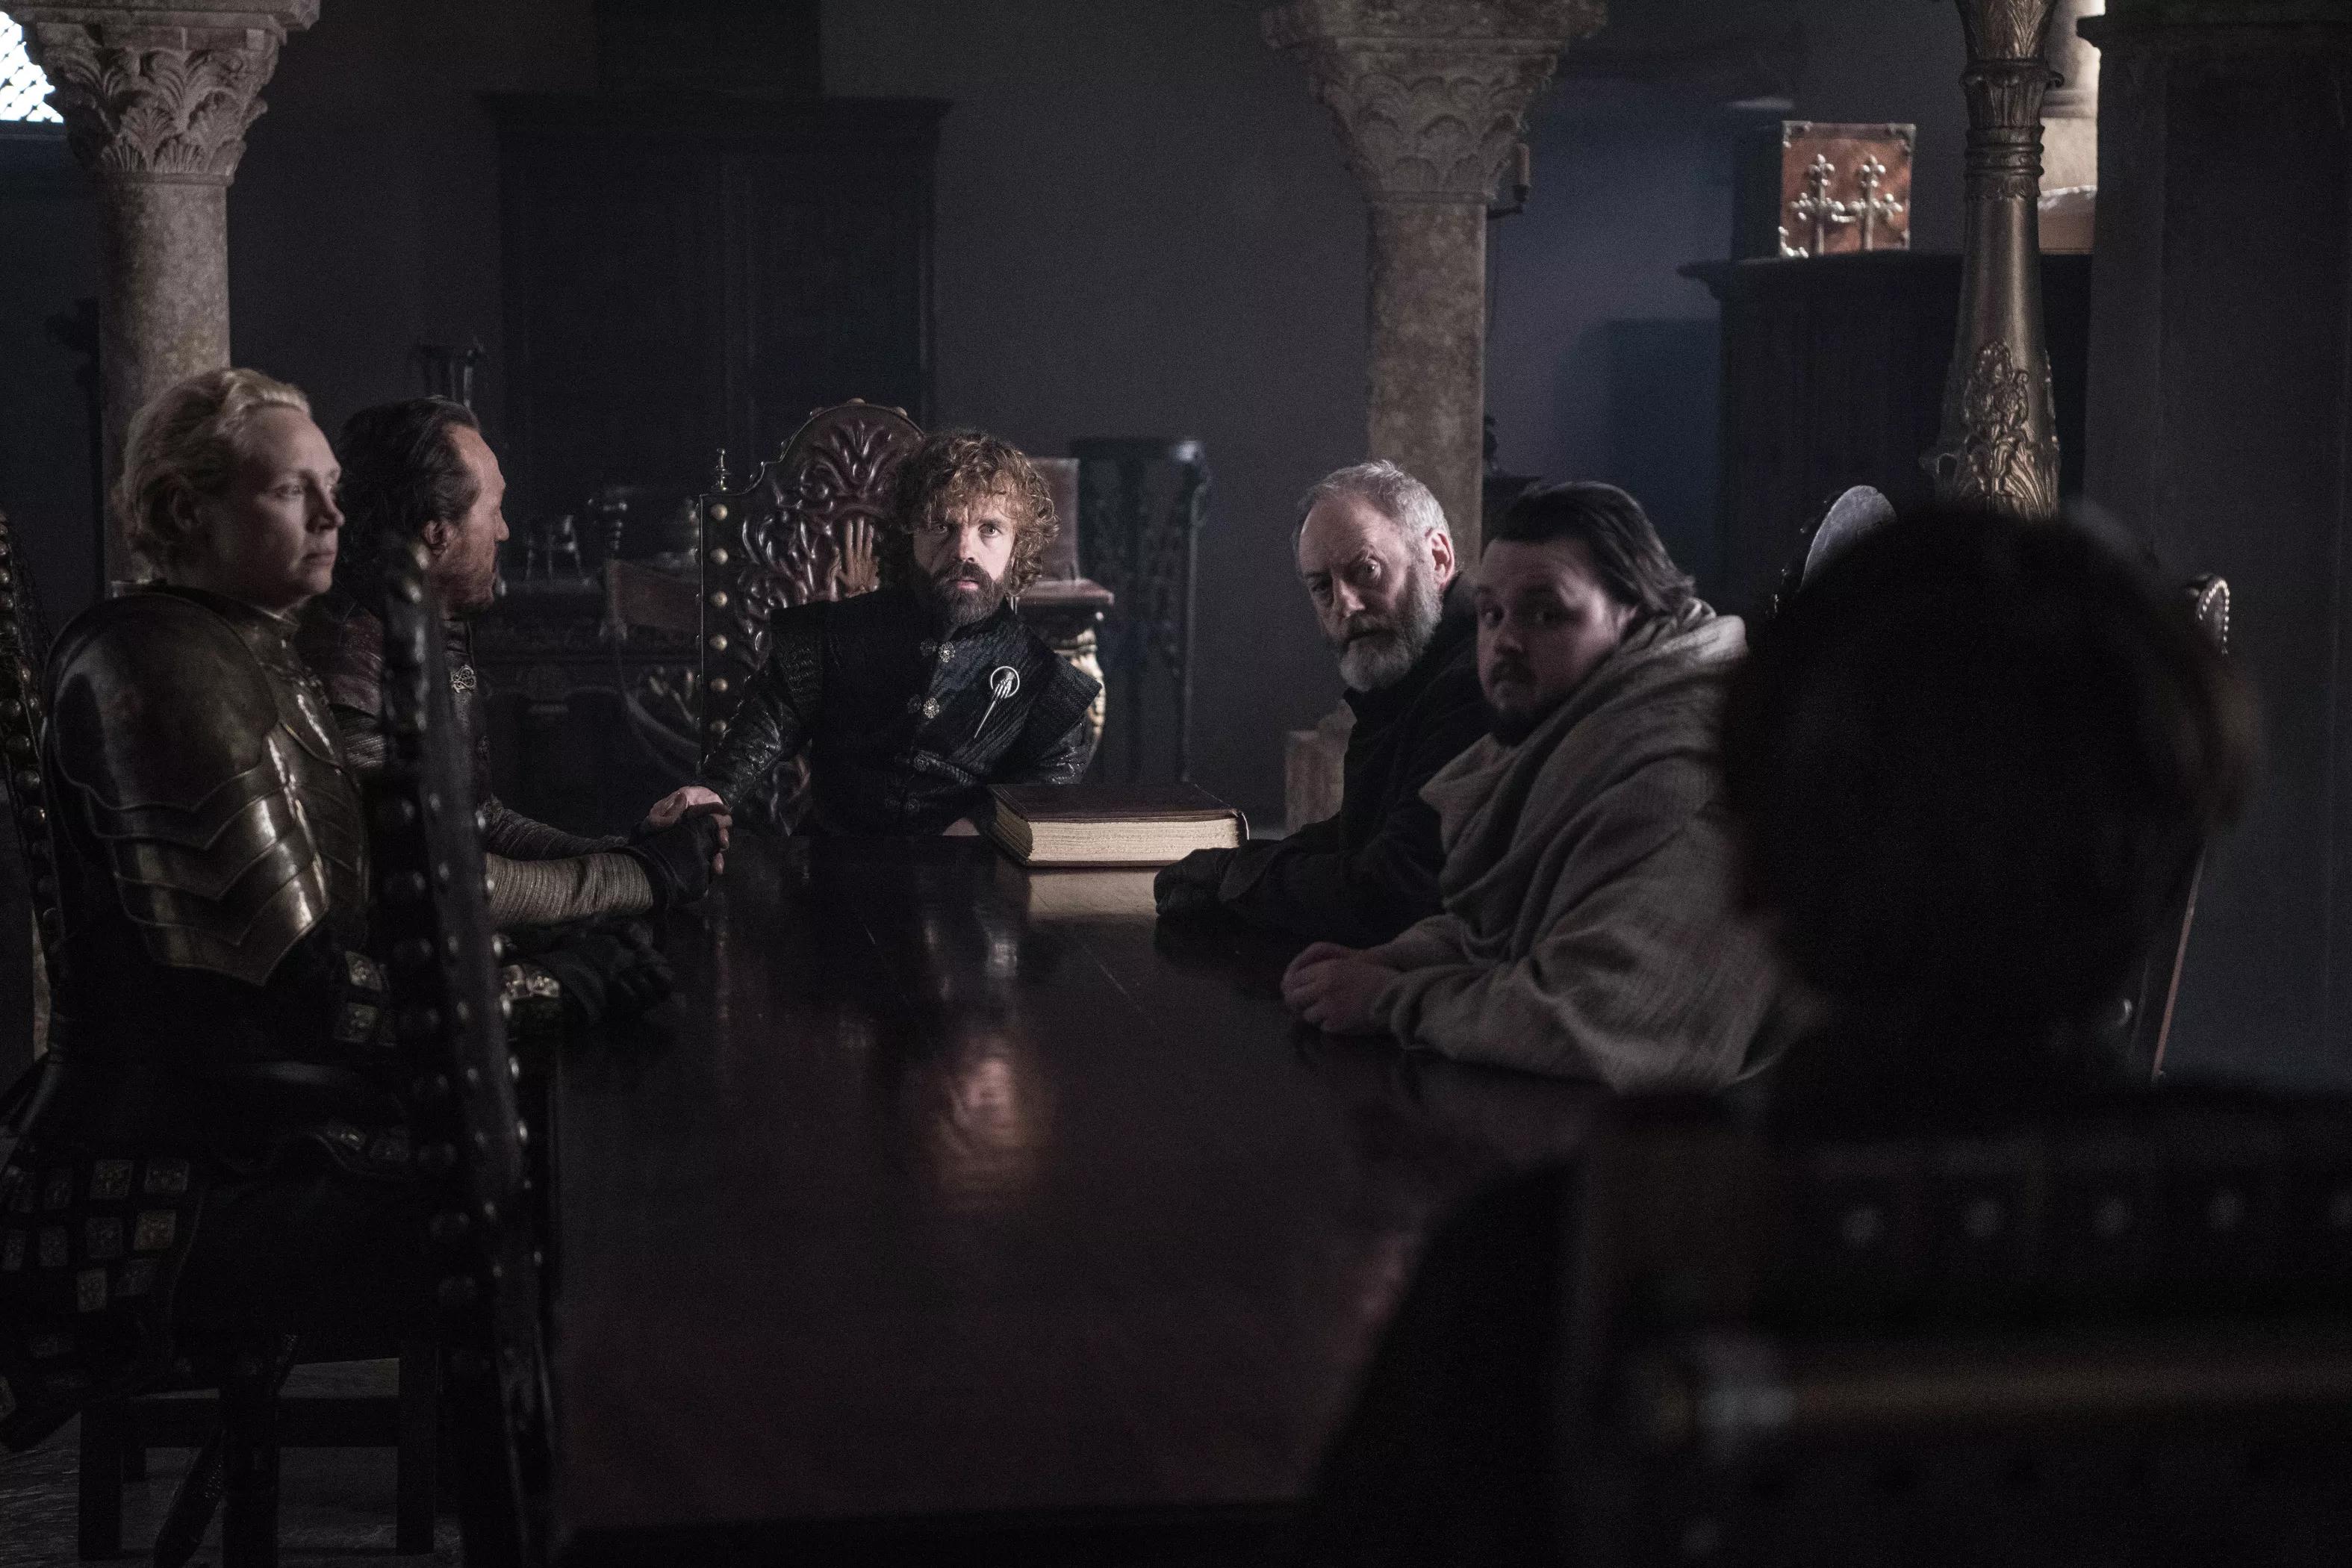 8x06 - The Iron सिंहासन - The Small Council